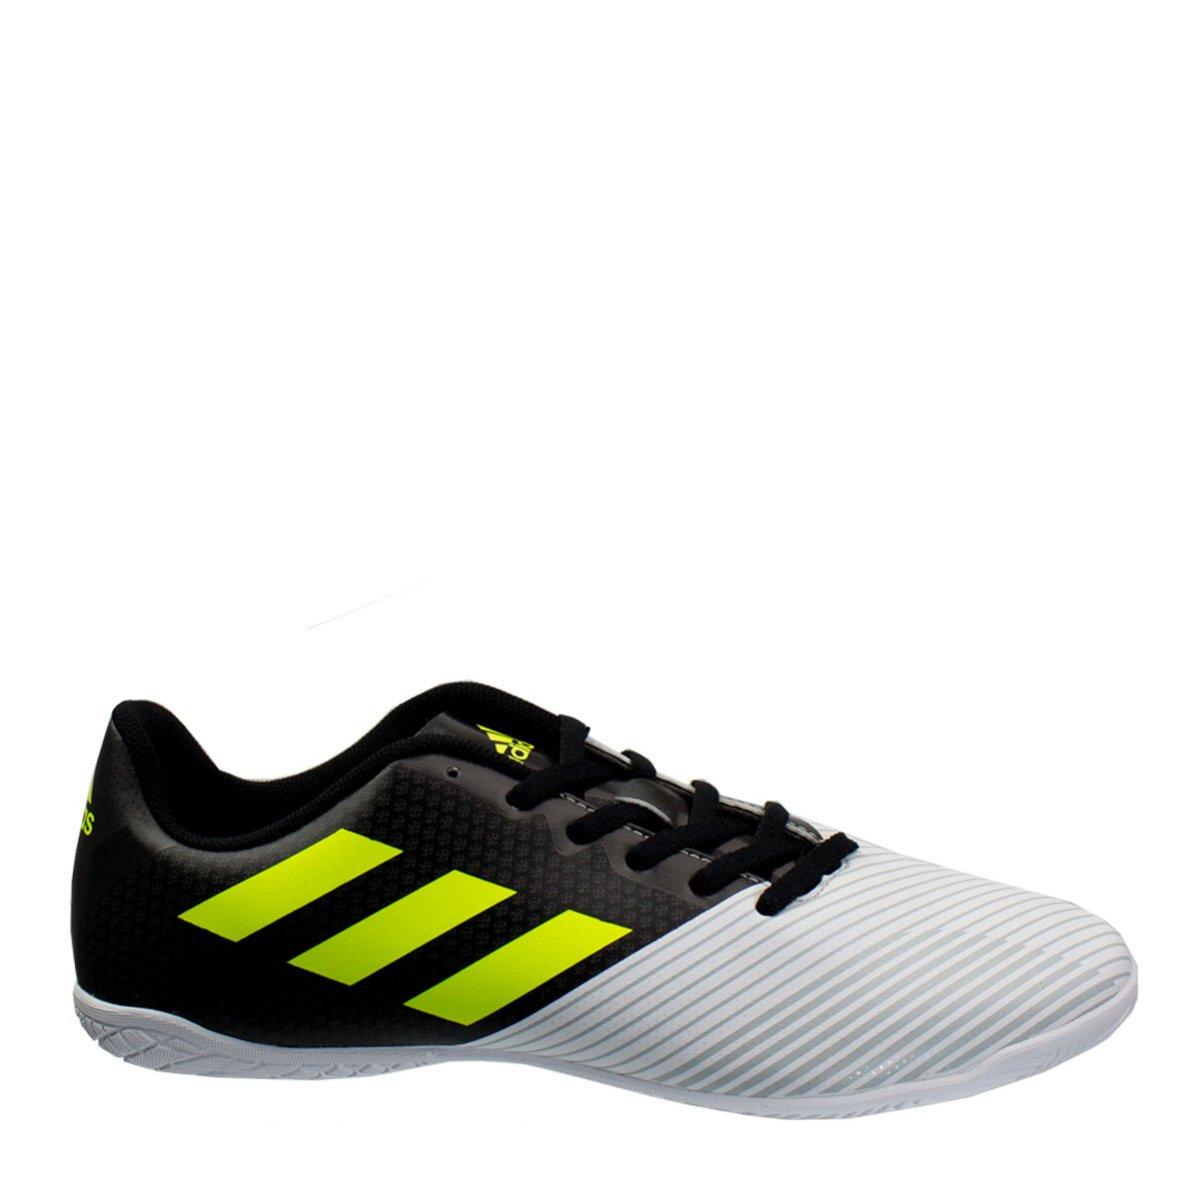 Bizz Store - Chuteira Futsal Adidas Artilheira II IN Couro 373fc530f02d7